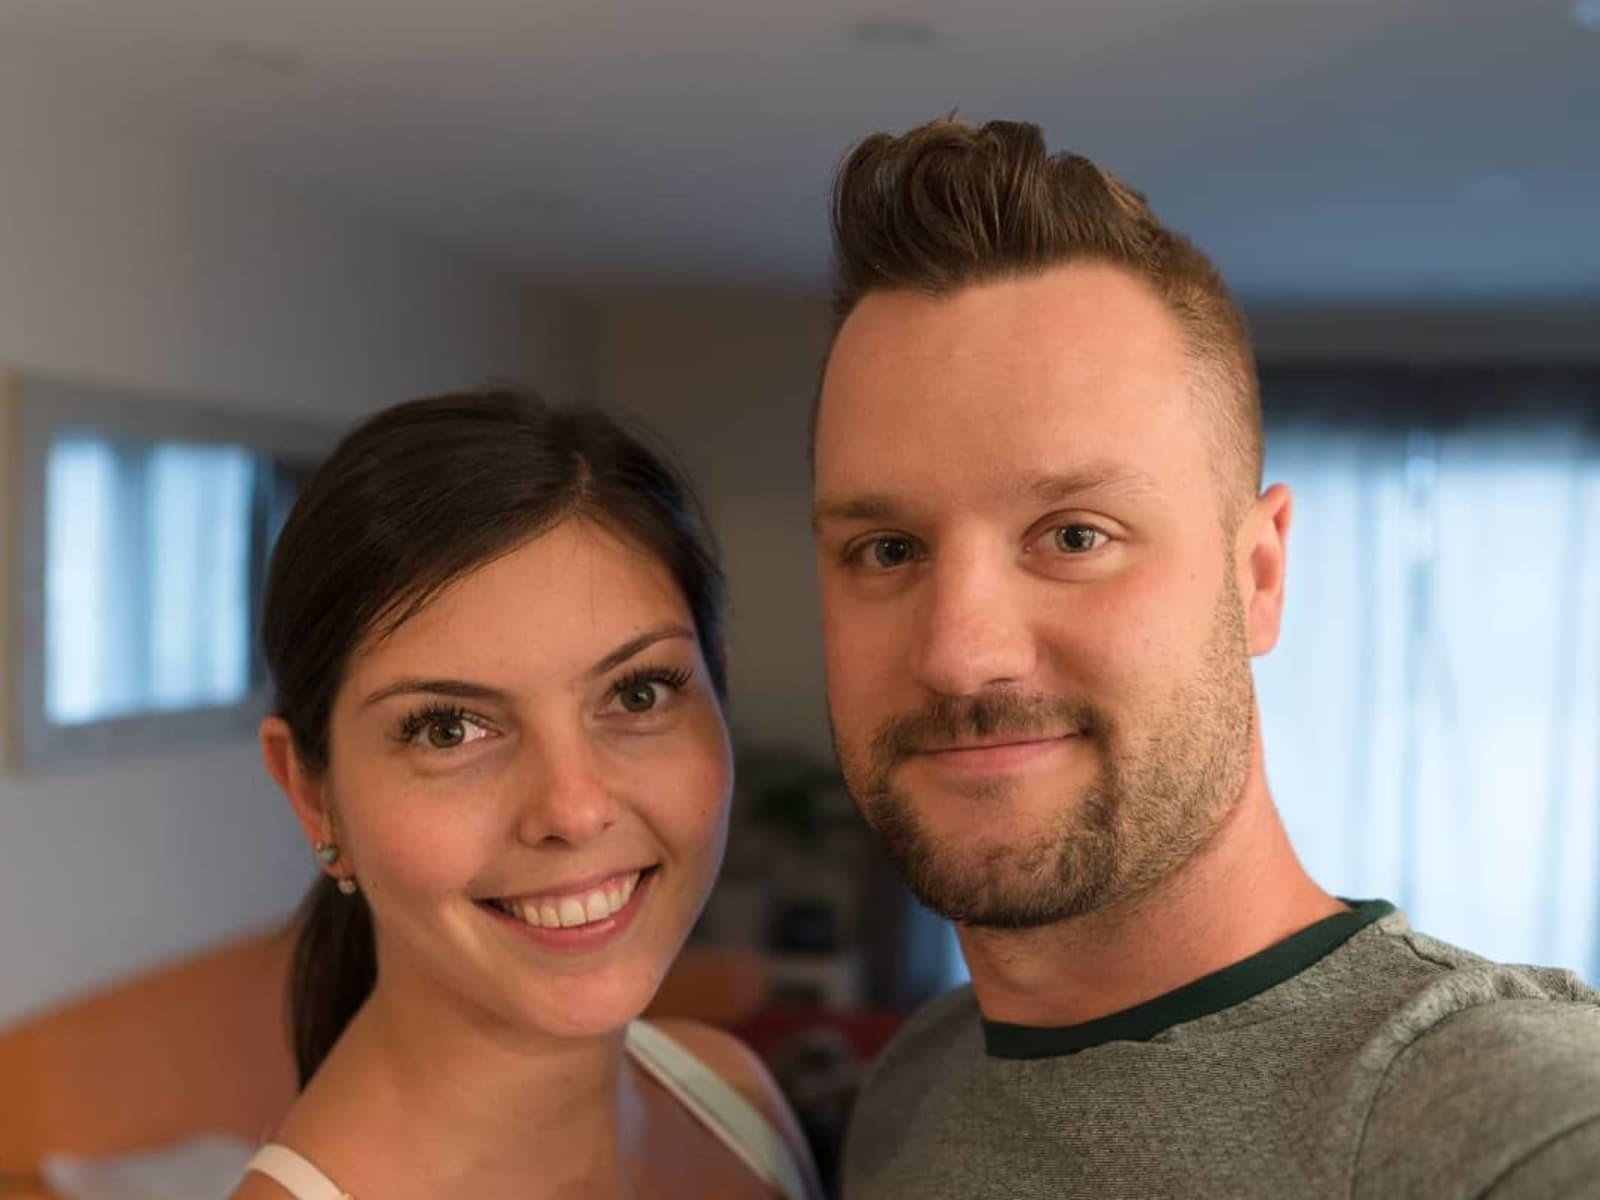 Iryna & igor & Igor from Toronto, Ontario, Canada